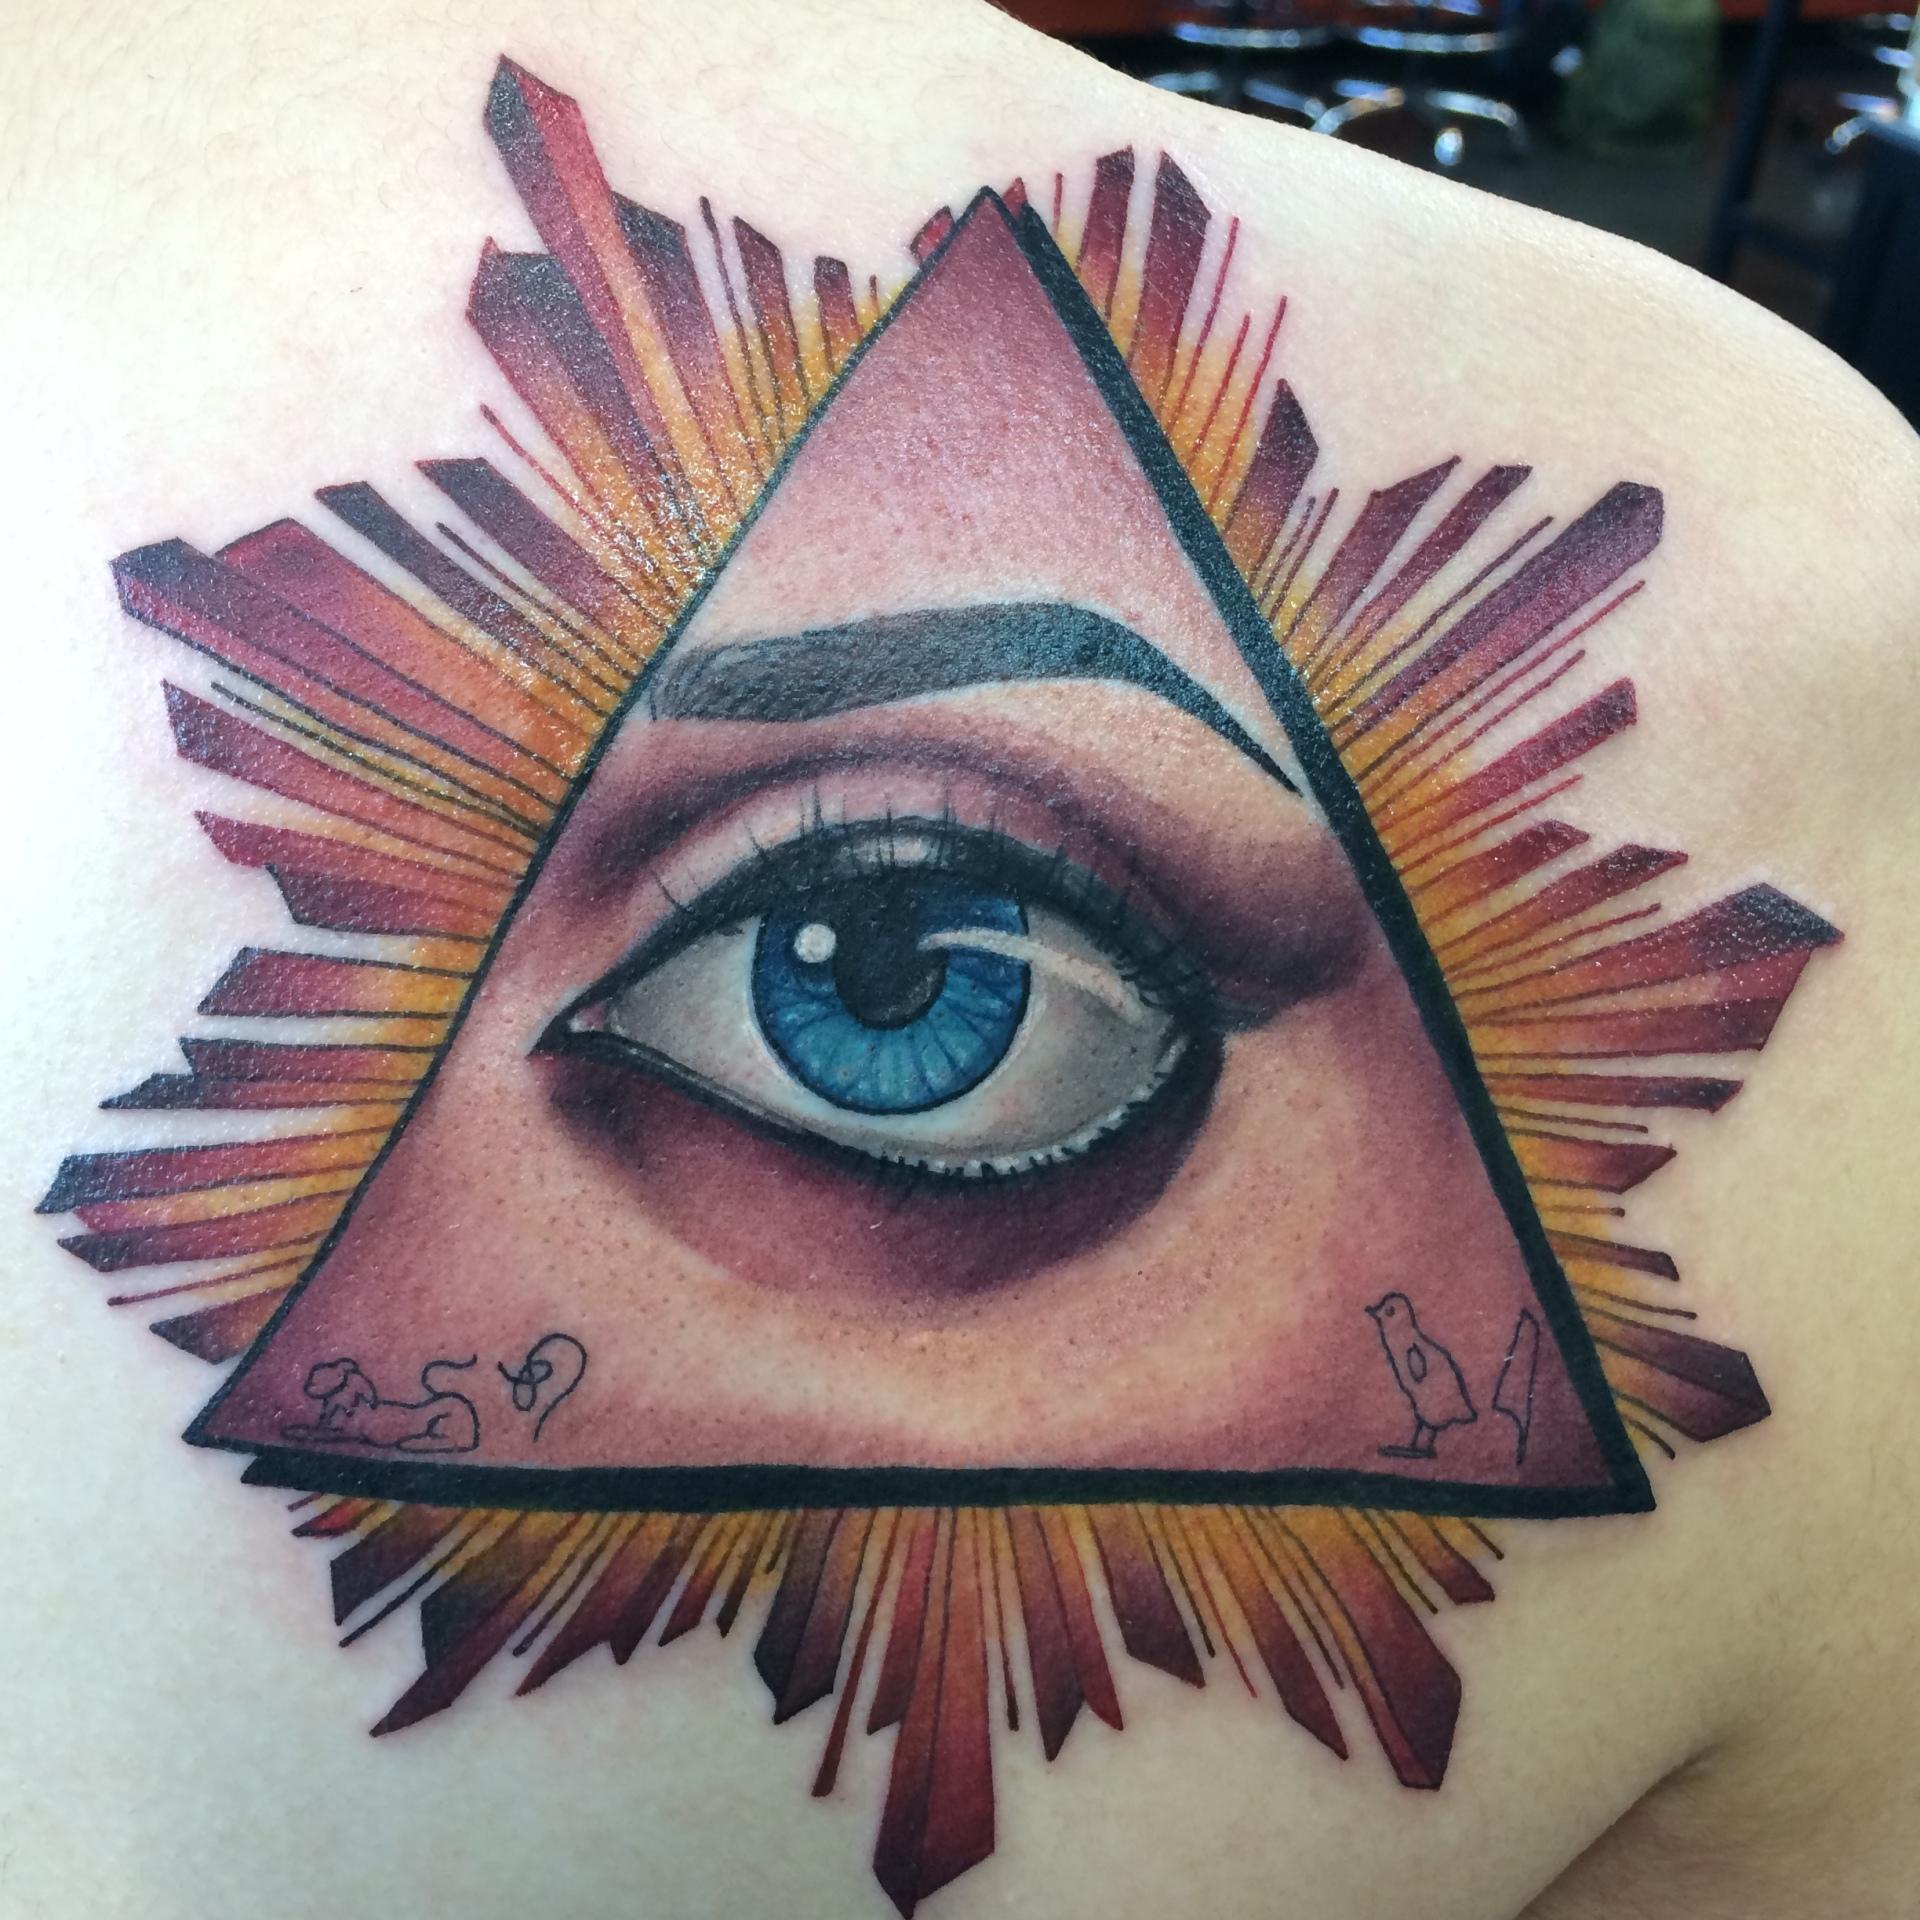 illuminati, allseeingeye, tattoo, eye tattoo, pyramid, color tattoo, art, nakota